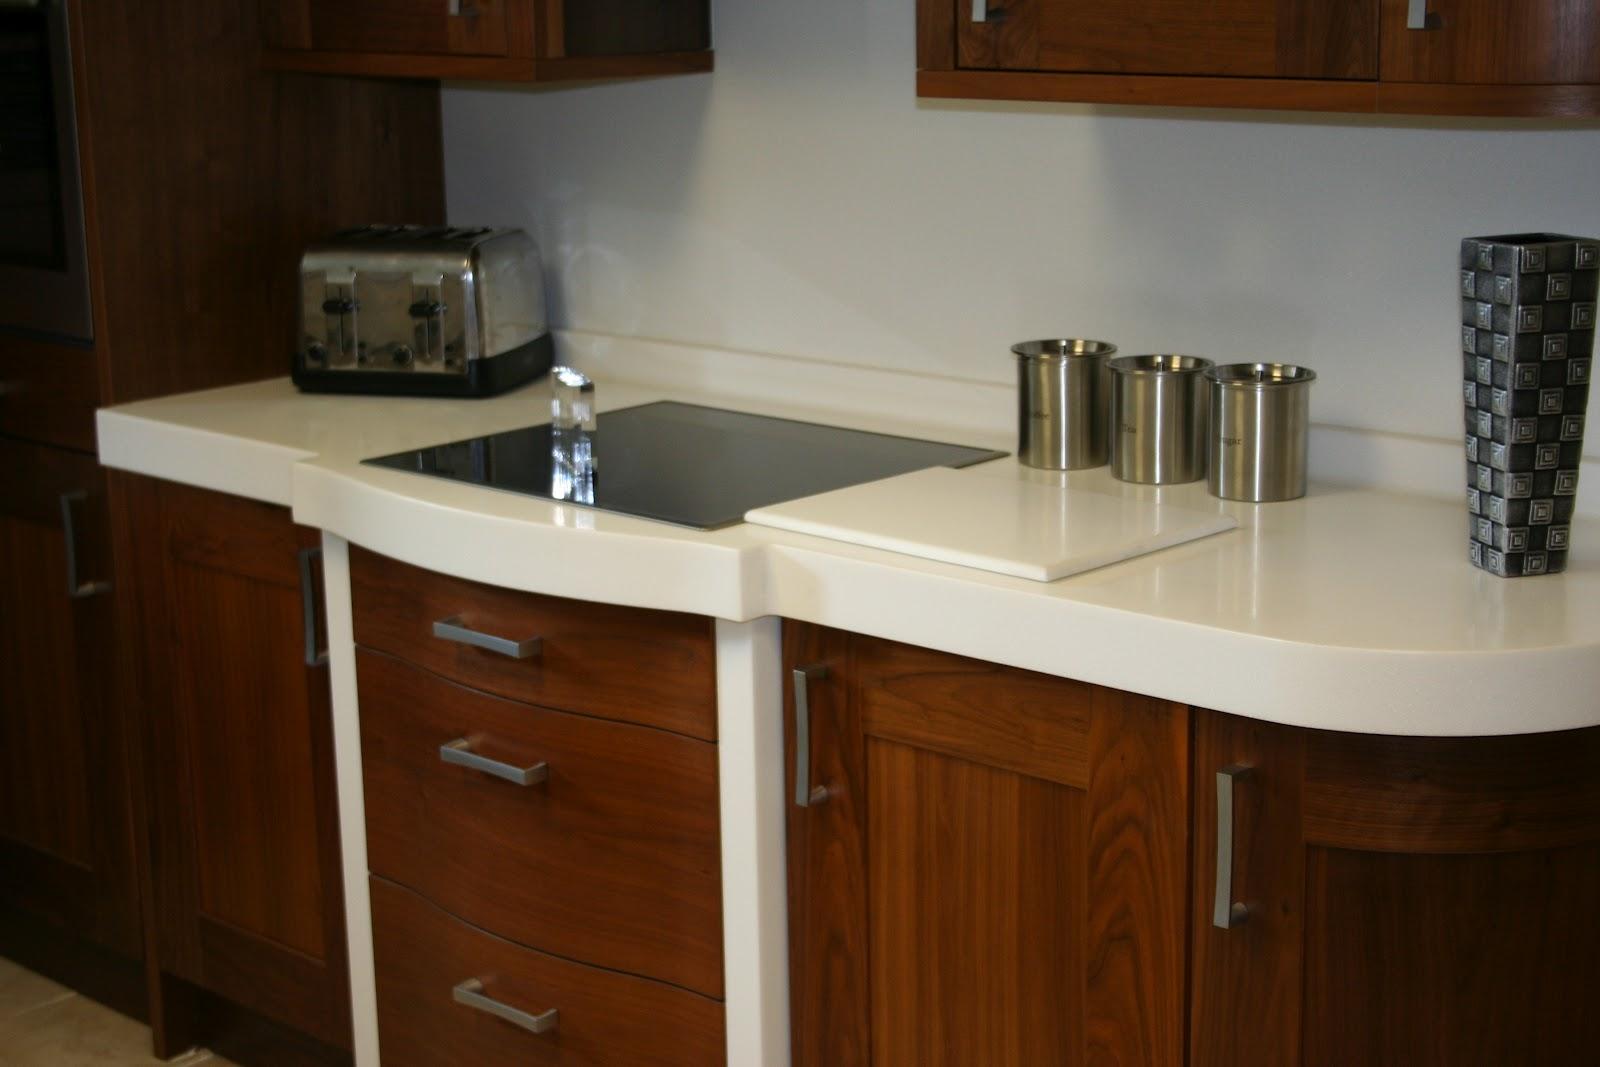 corian cameo white curved display corian corian worktops corian prices. Black Bedroom Furniture Sets. Home Design Ideas